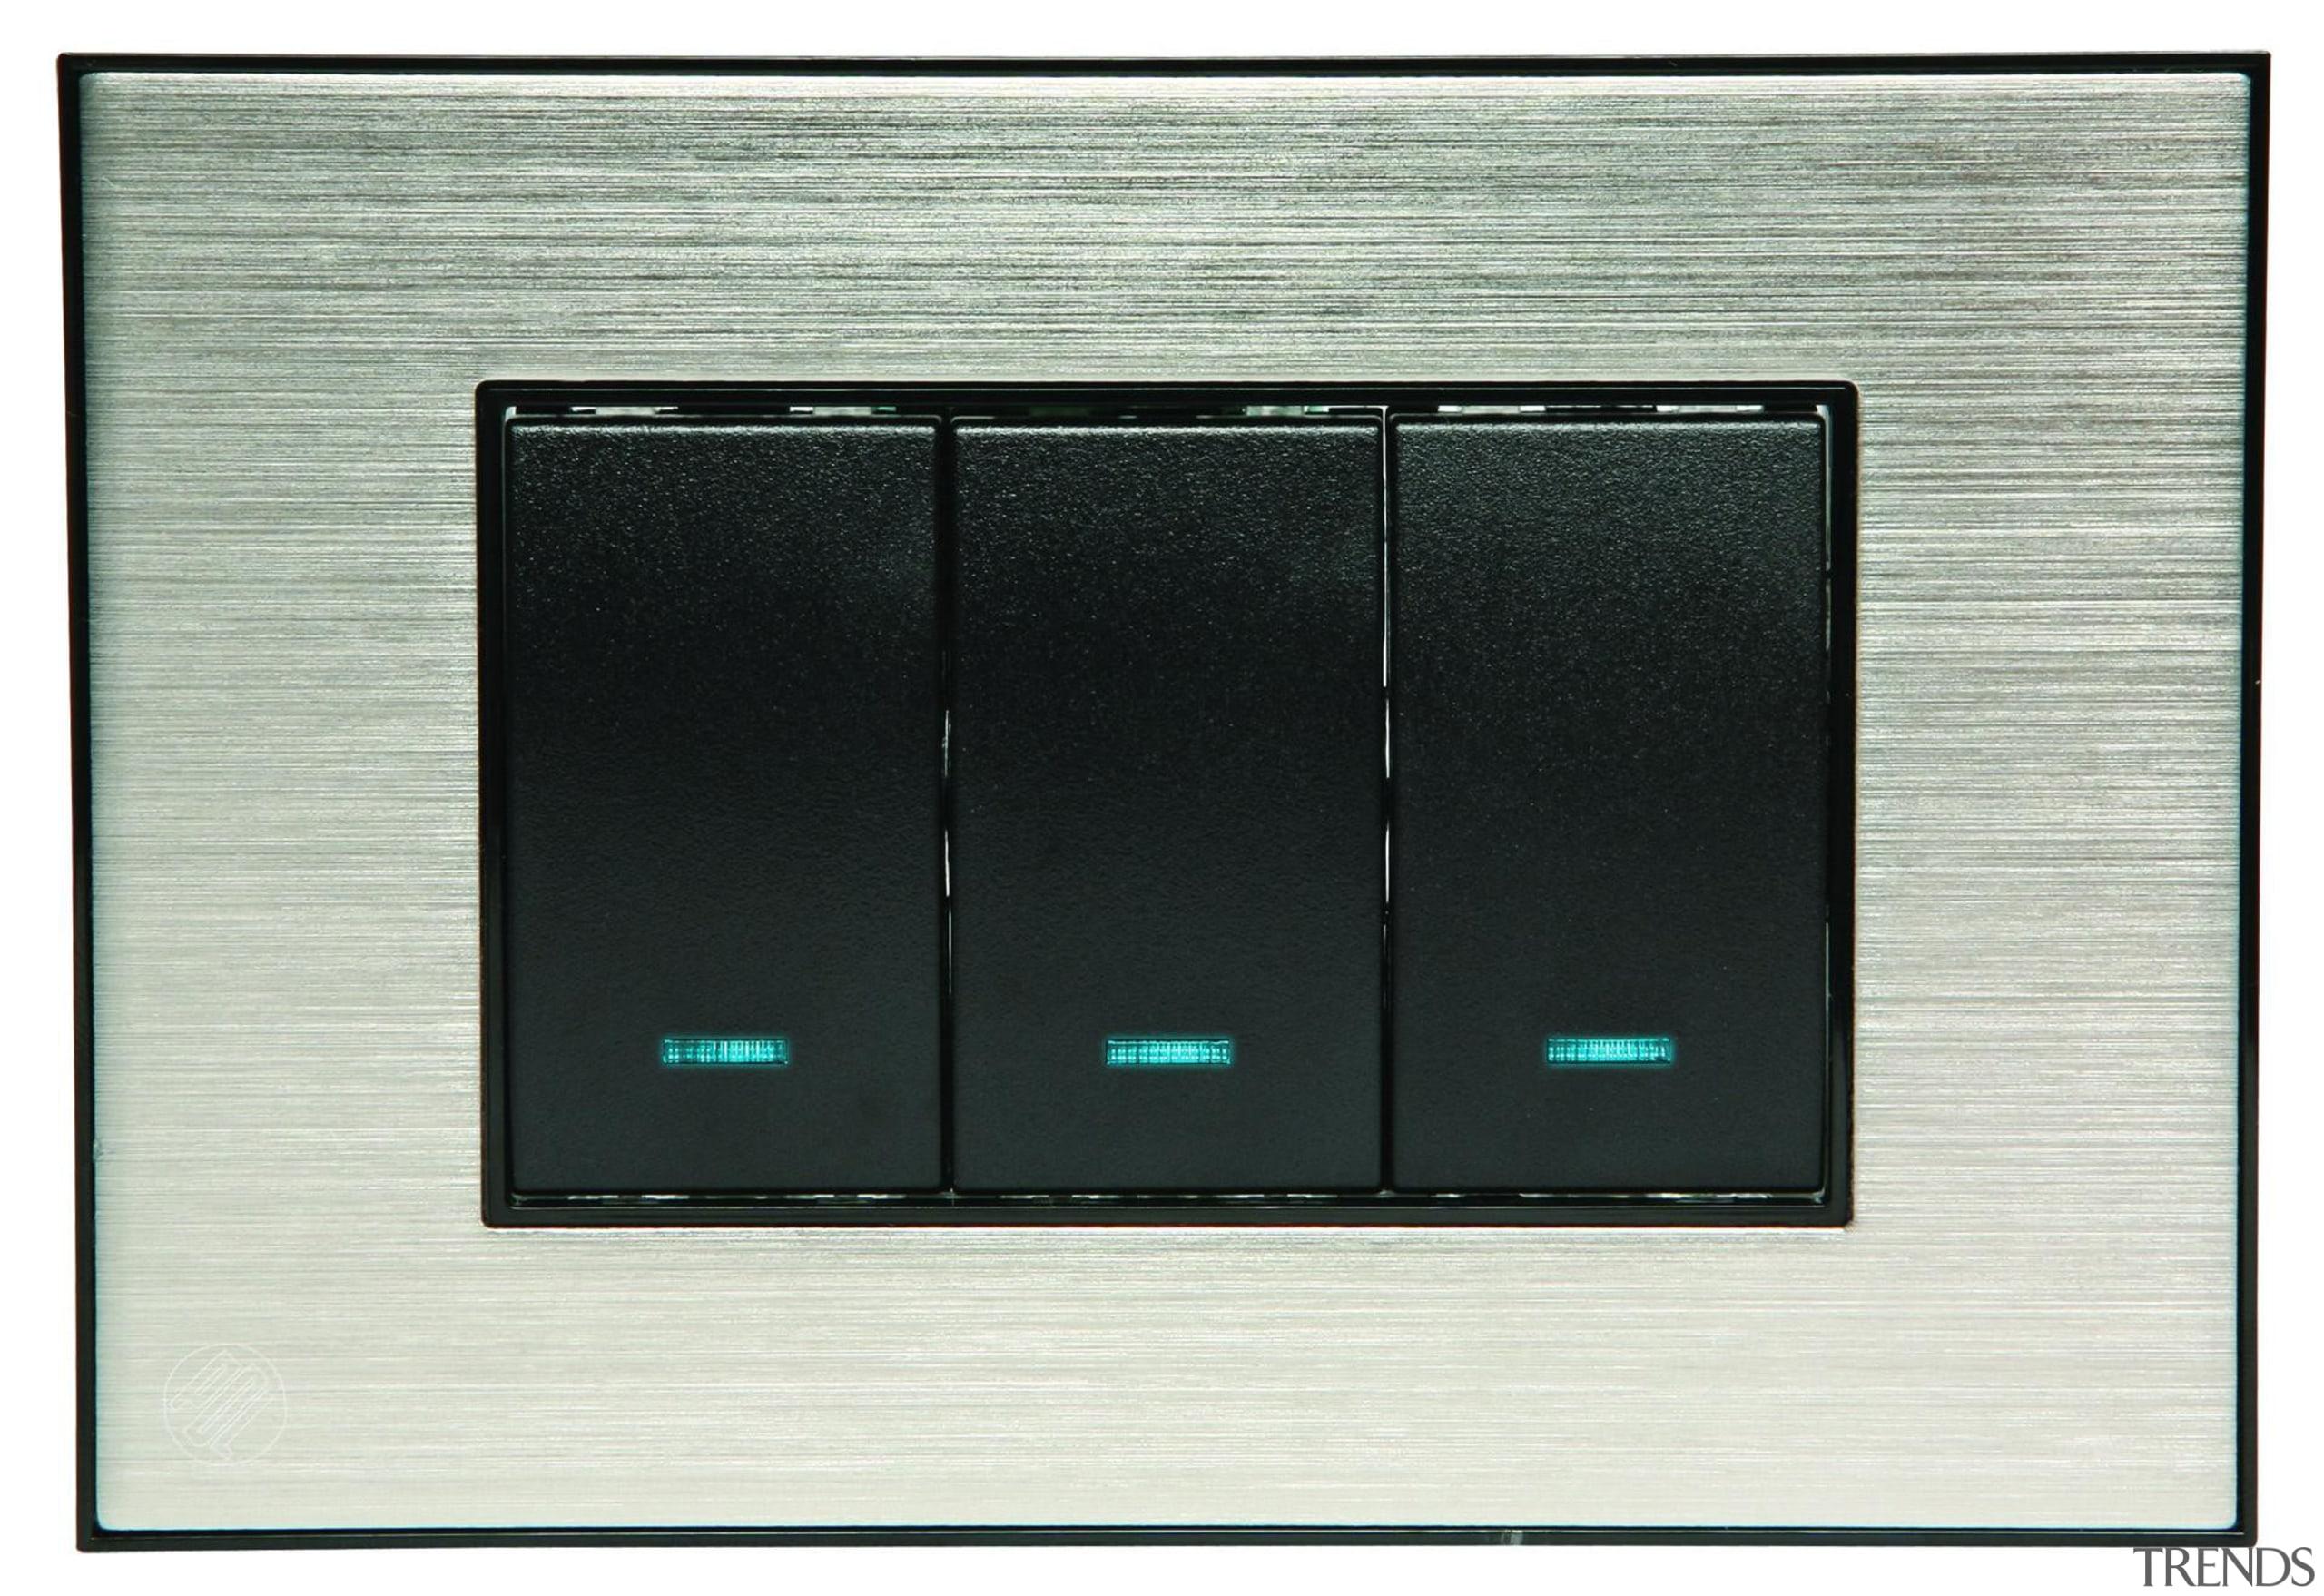 strato black 3 switch-0039847 copy.jpg - strato_black_3_switch-0039847_copy.jpg - electronic component, electronic device, technology, white, black, gray